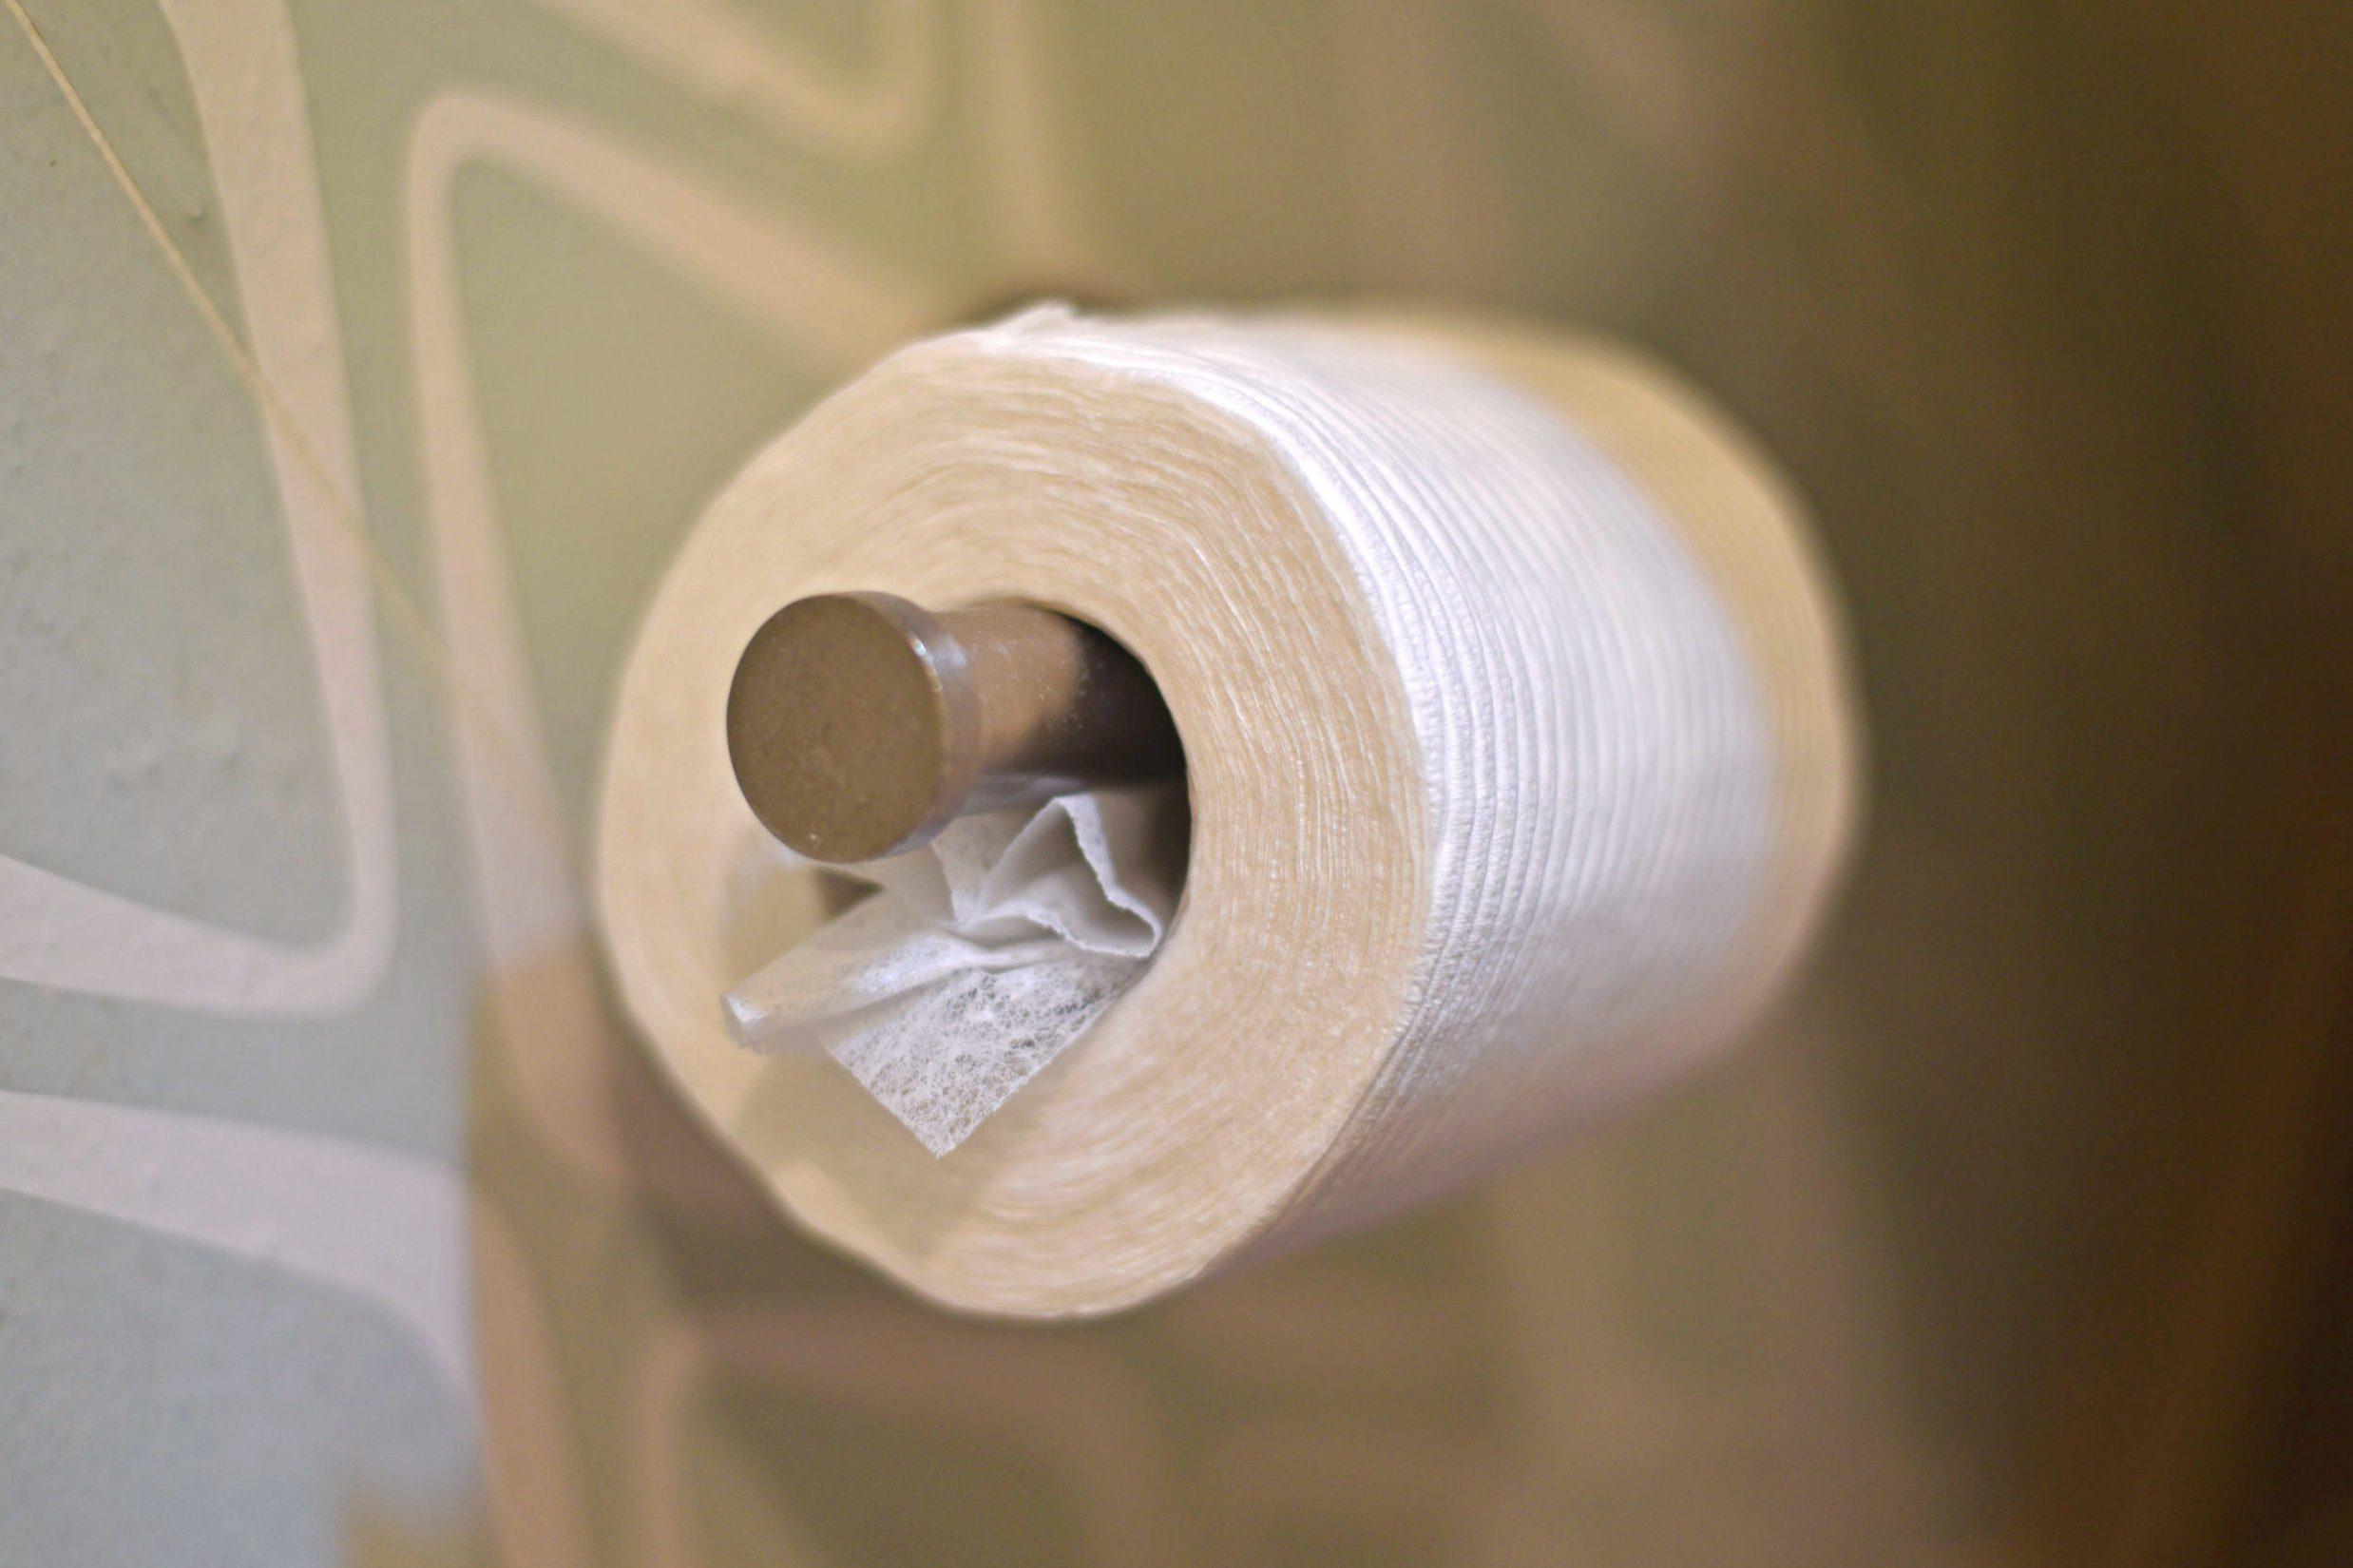 toilet paper dryer sheets life hacks